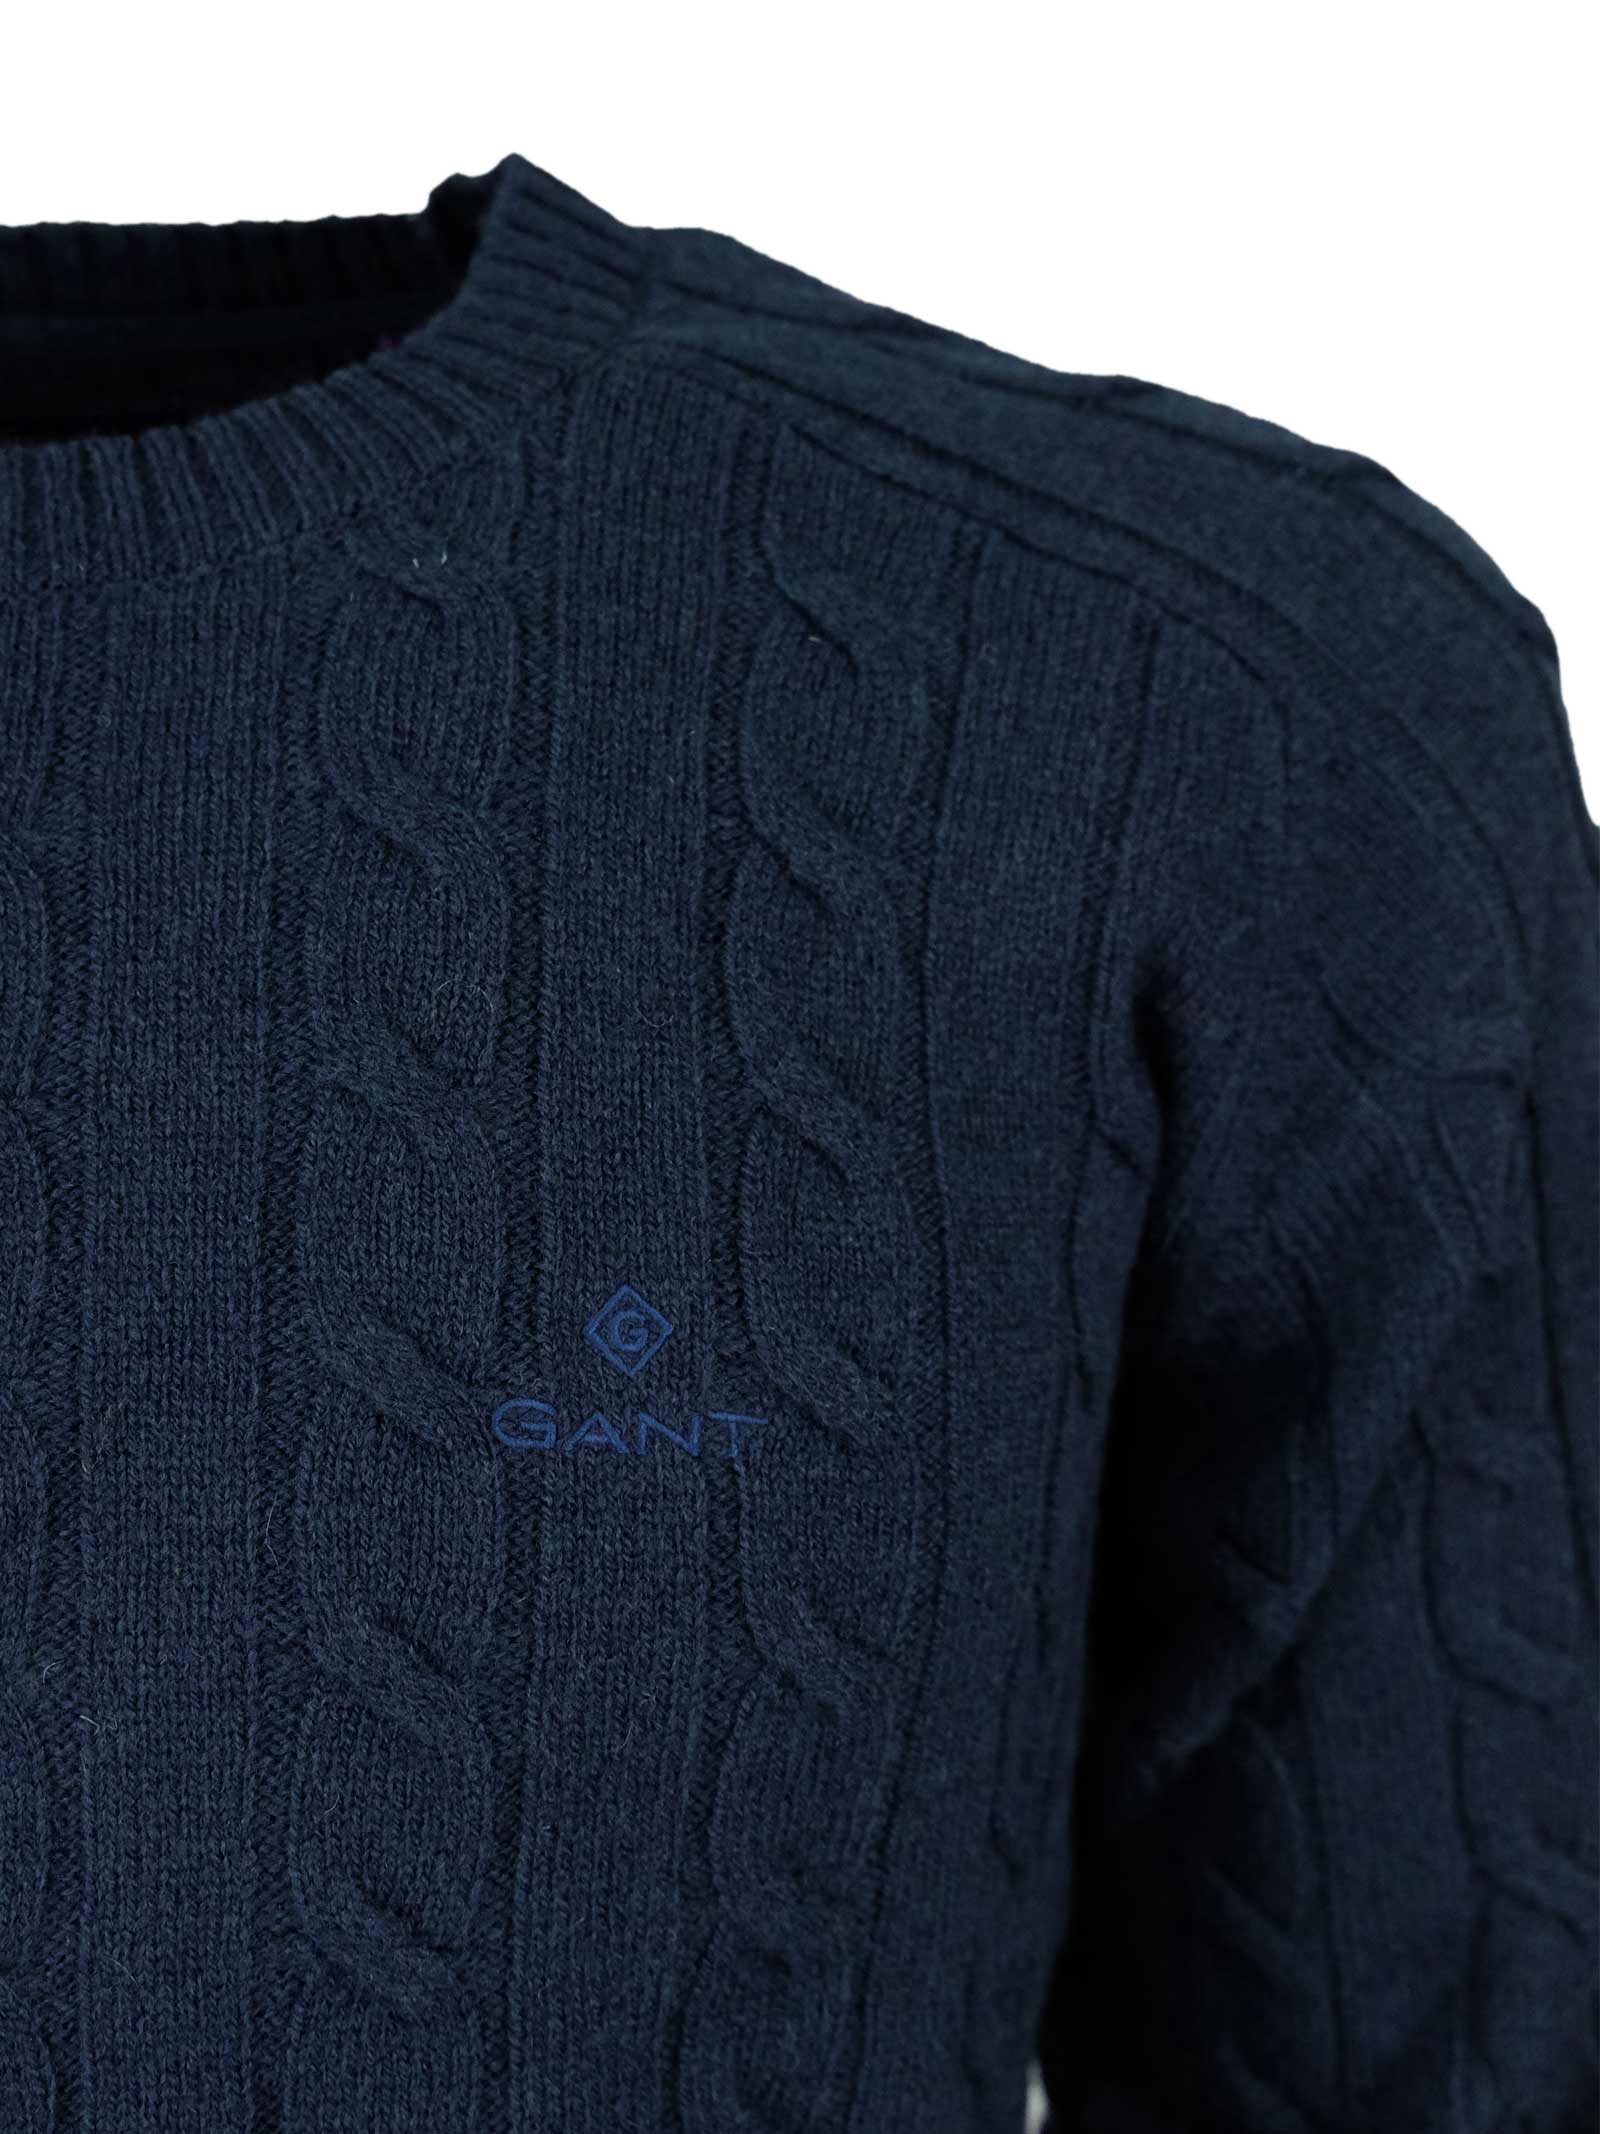 ROUNDNECK PULLOVER GANT | Knitwear | 8050076433